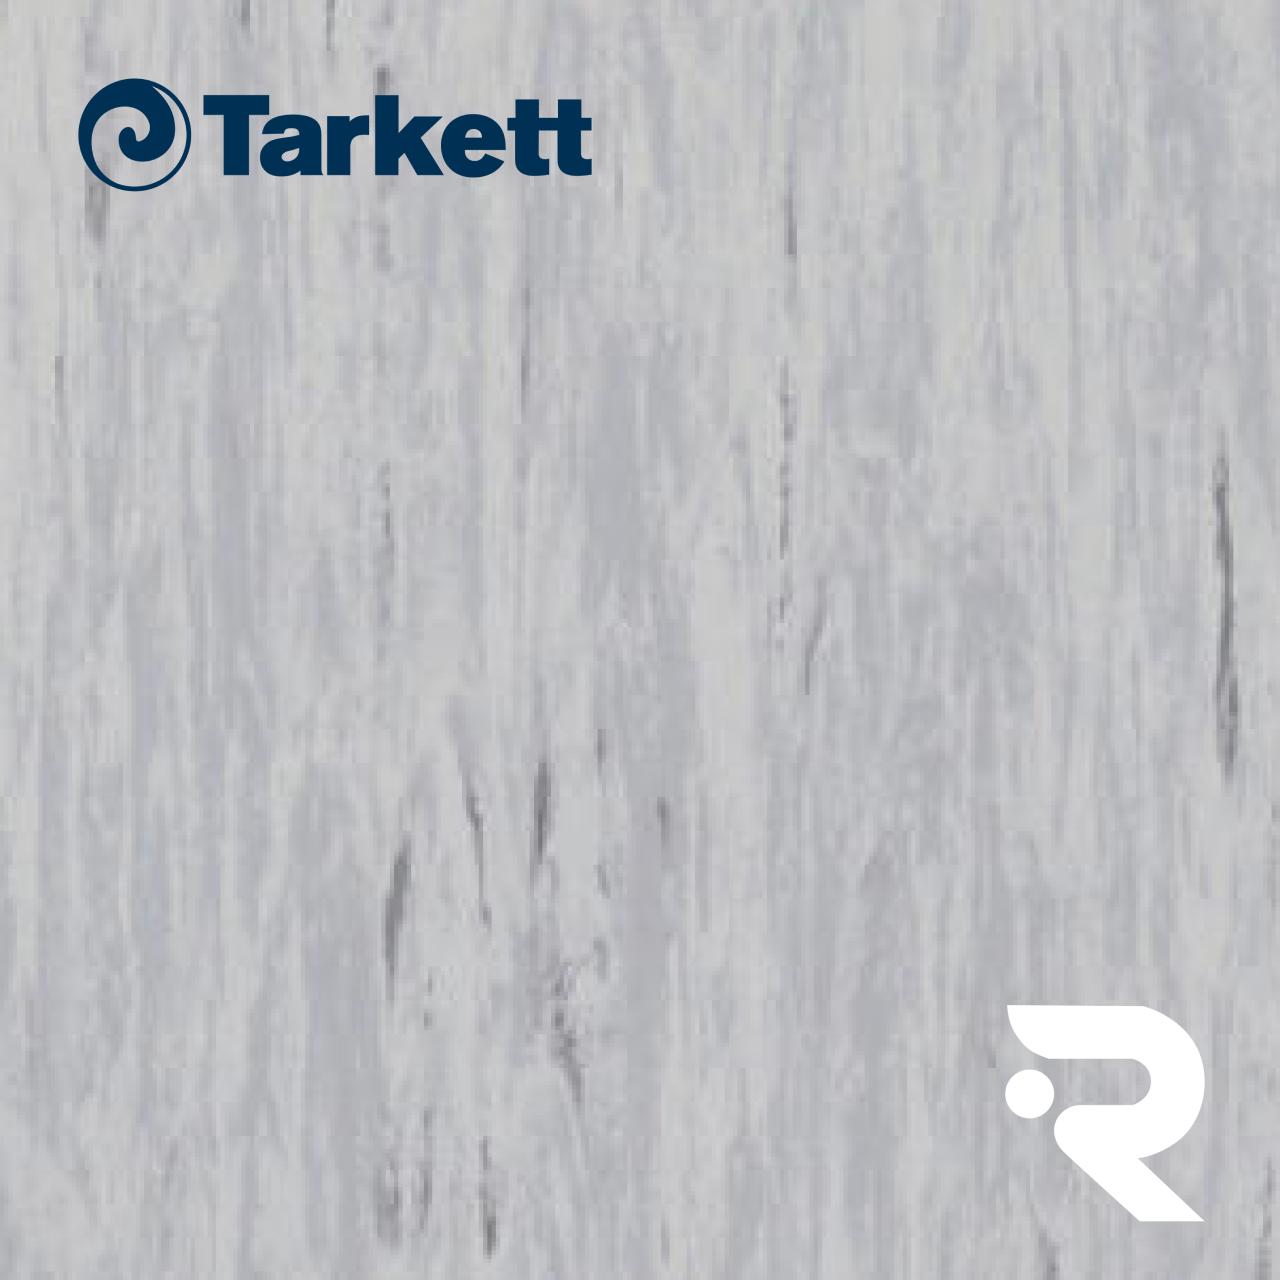 🏫 Гомогенный линолеум Tarkett | Standard LIGHT BEIGE GREY 0494 | Standard Plus 2.0 mm | 610 х 610 мм